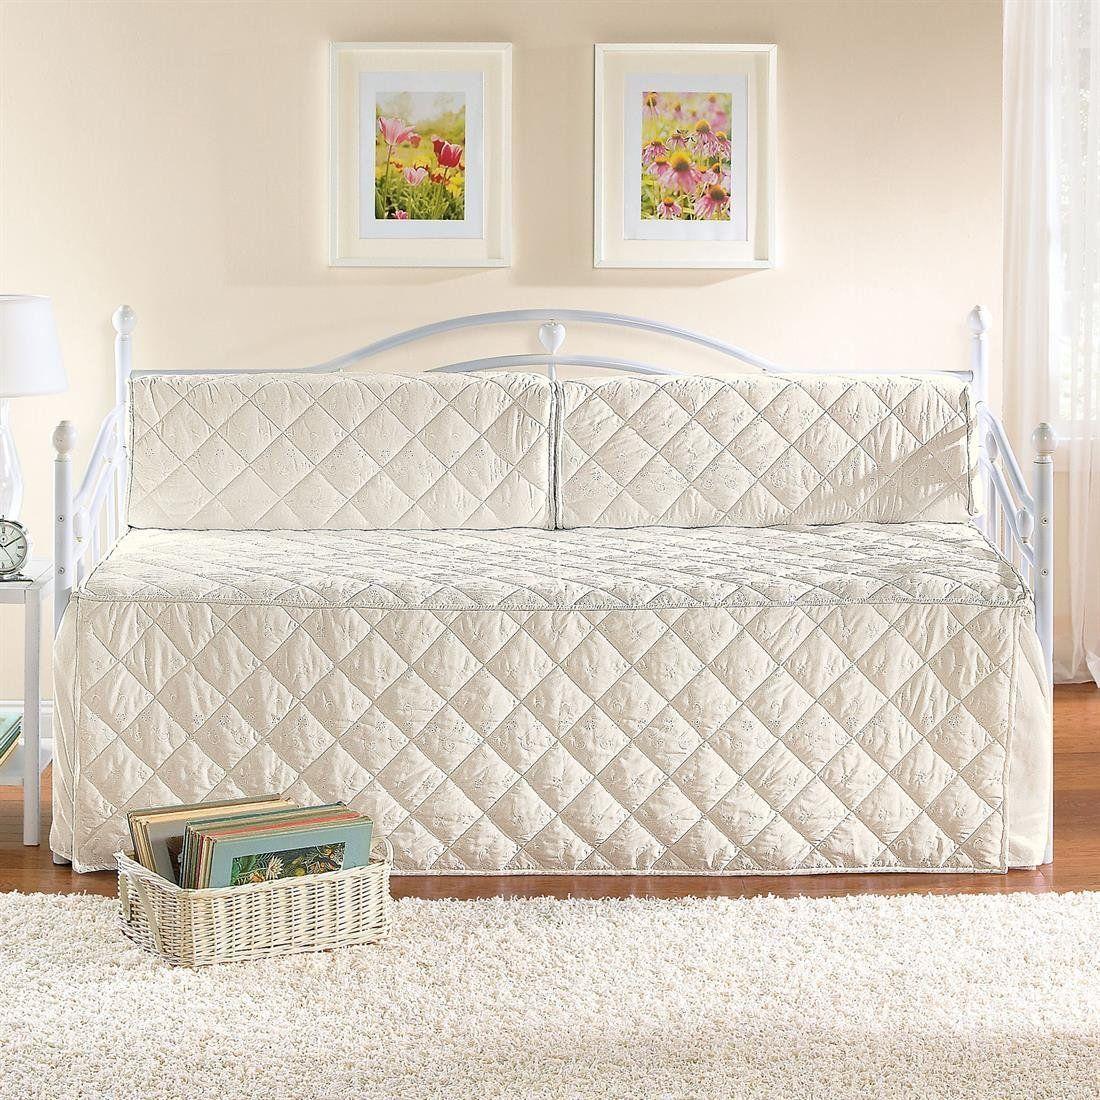 White Eyelet Daybed Set Daybed Bedding Sets Daybed Bedding